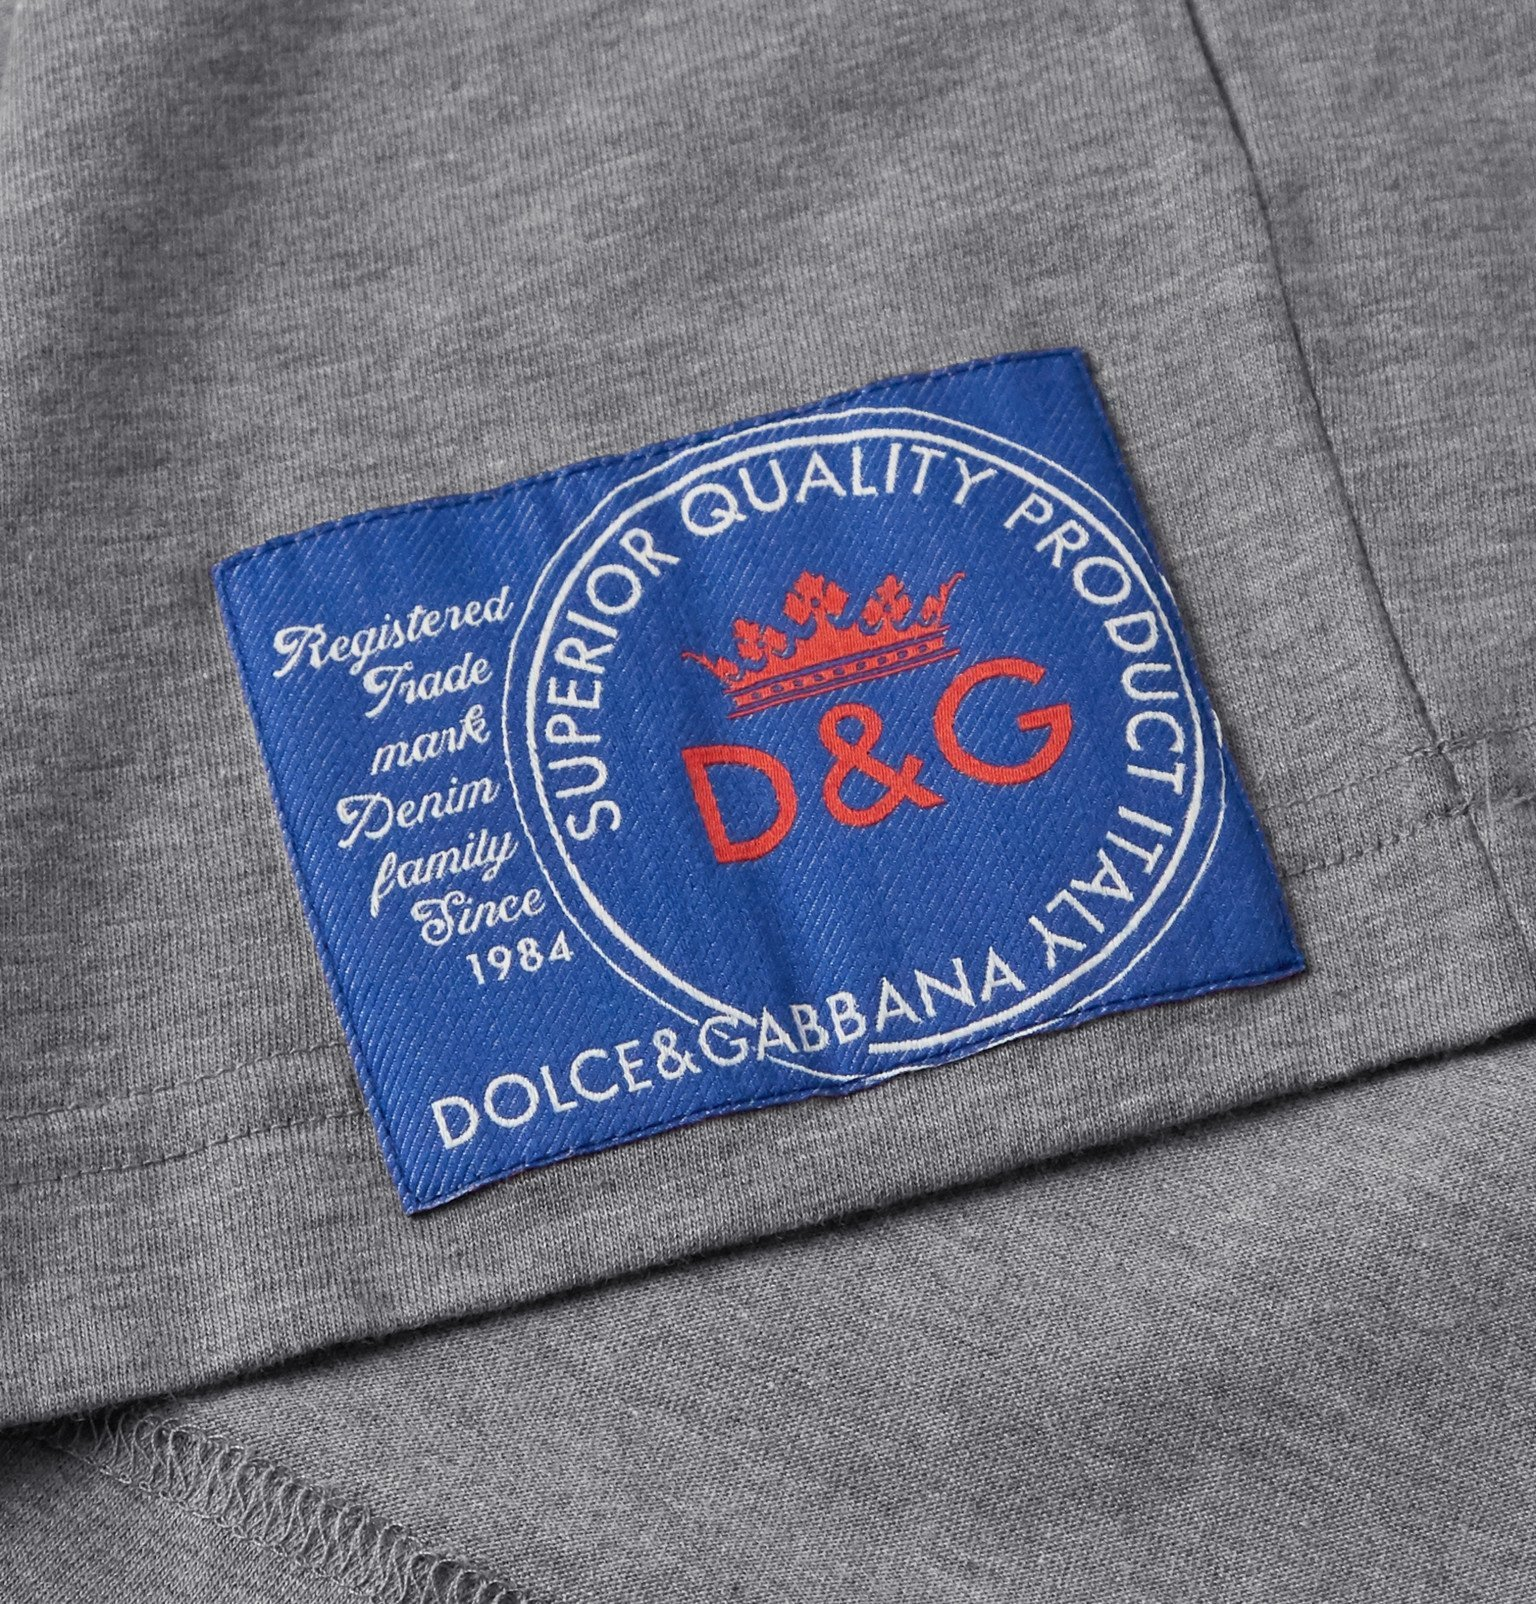 Dolce & Gabbana - Slim-Fit Logo-Appliquéd Cotton-Jersey T-Shirt - Gray